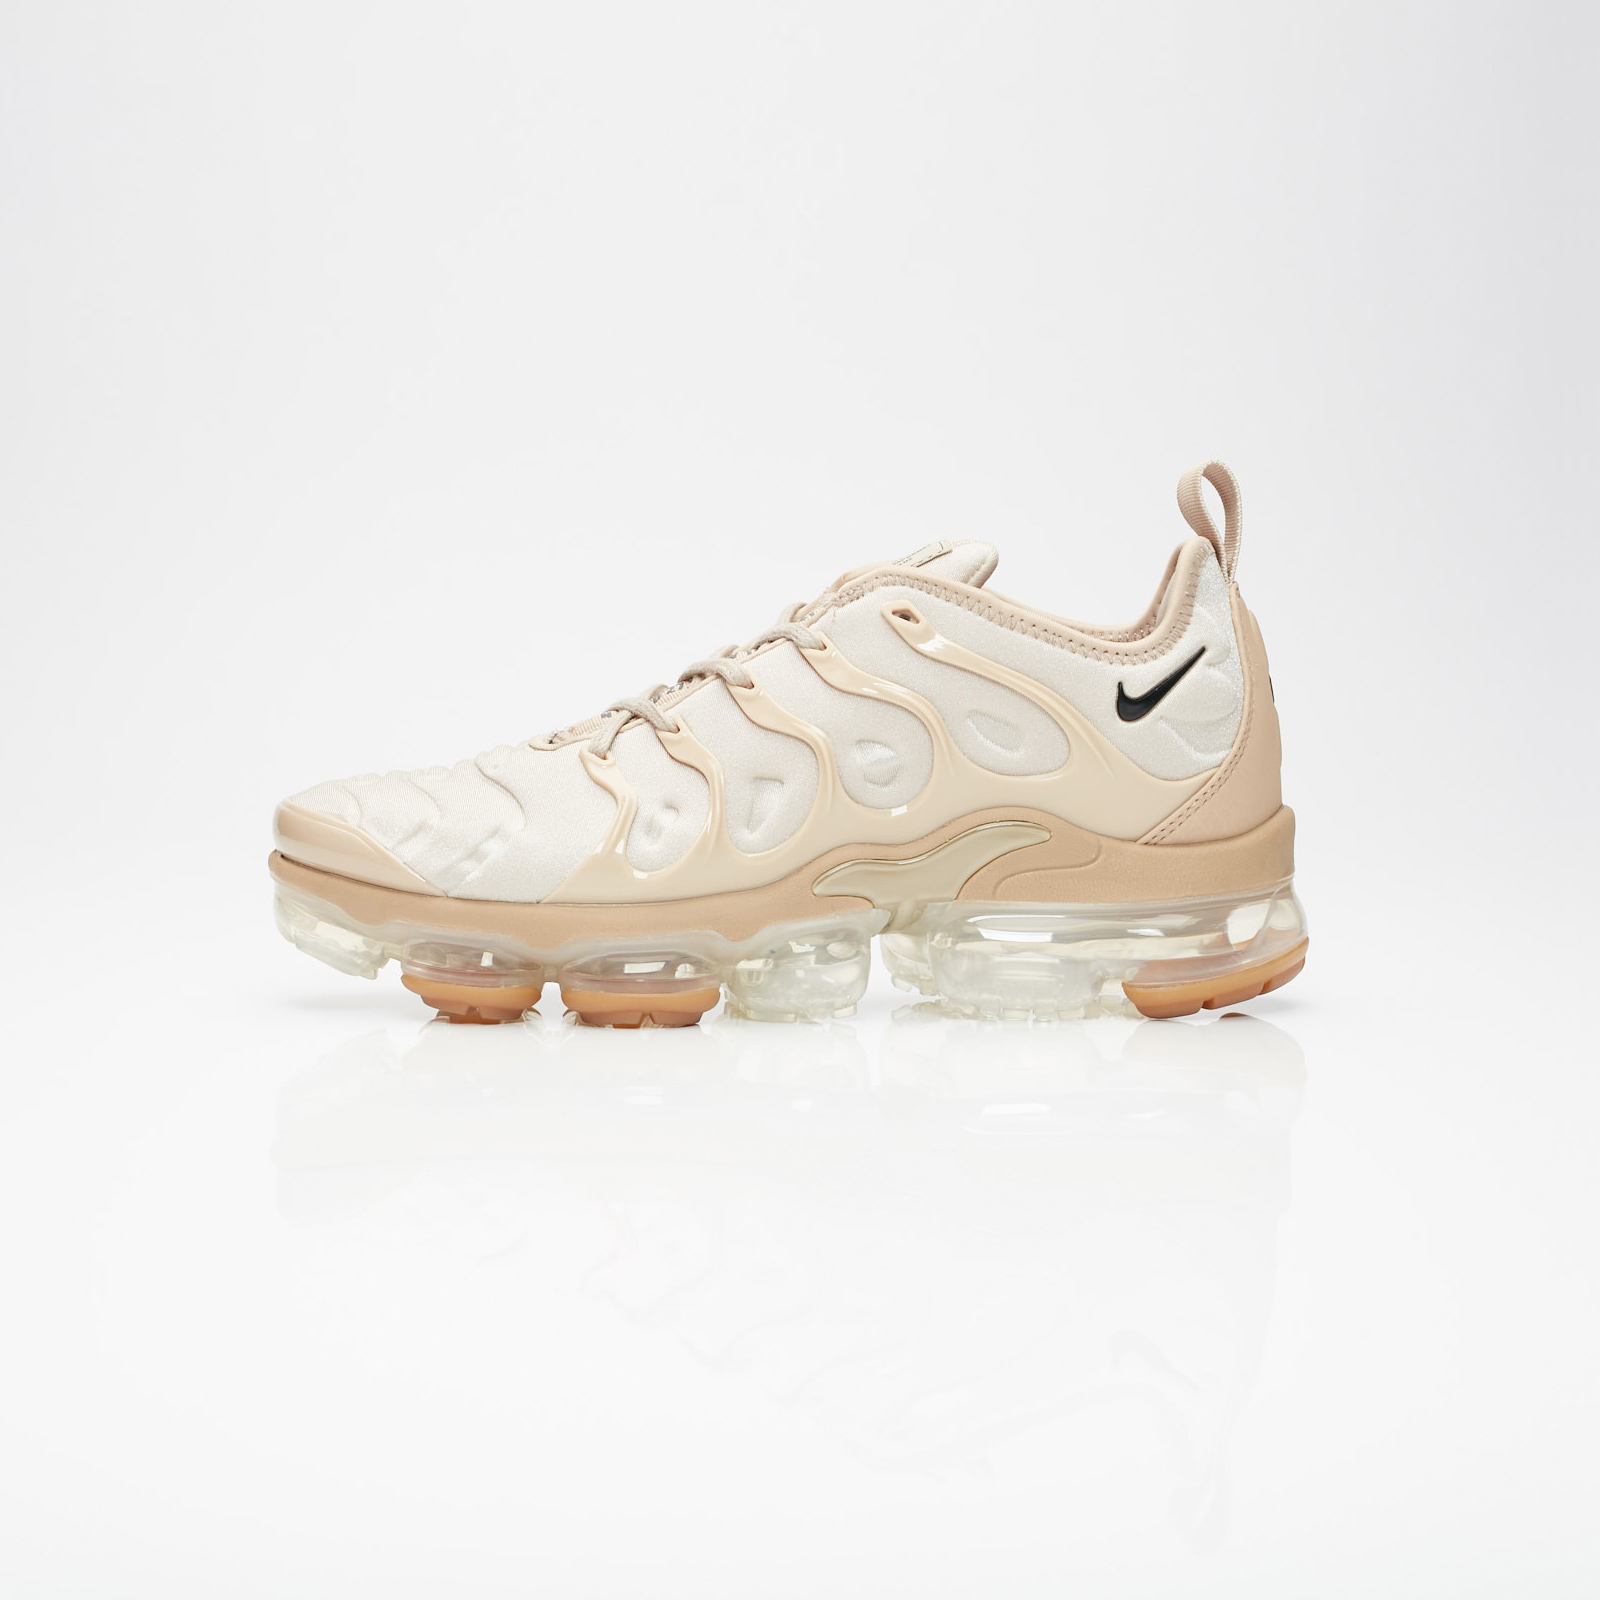 db5f31ac766 Nike Air Vapormax Plus At5681 200 Sneakersnstuff Sneakers. 95 Nike Air  Vapormax Plus Tm 520394 Size 28 35 18 4